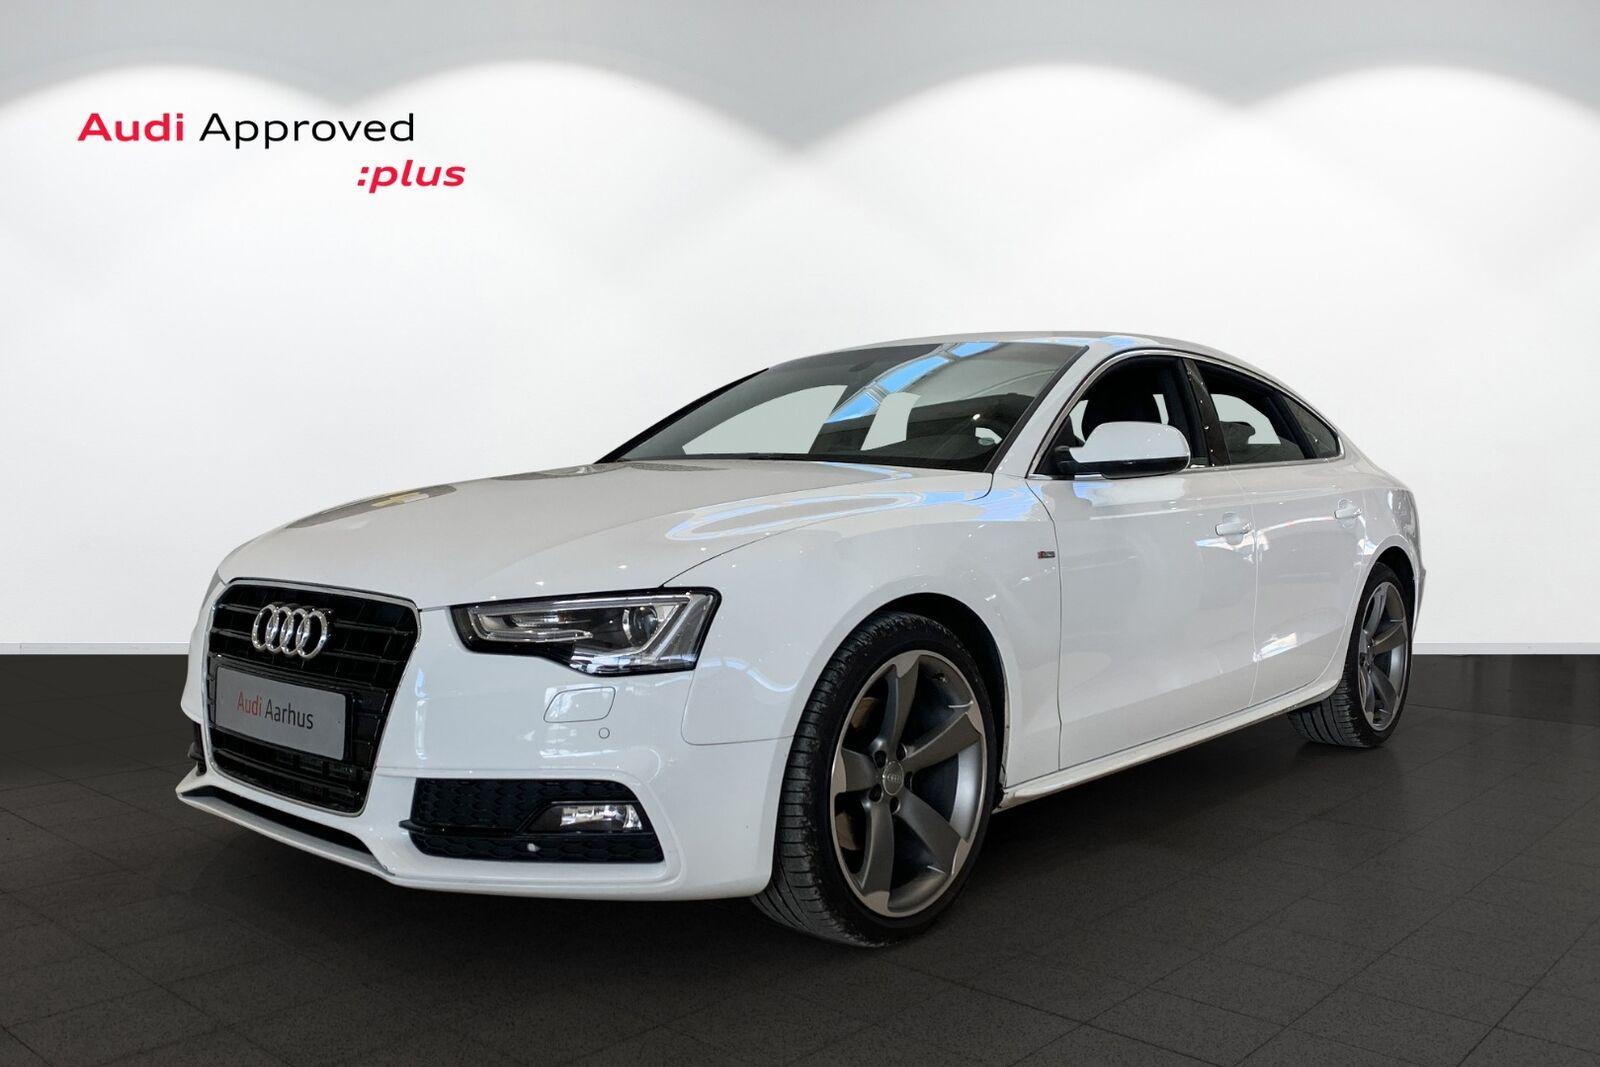 Audi A5 1,8 TFSi 144 Limited Sportback Multitr. 5d - 289.900 kr.